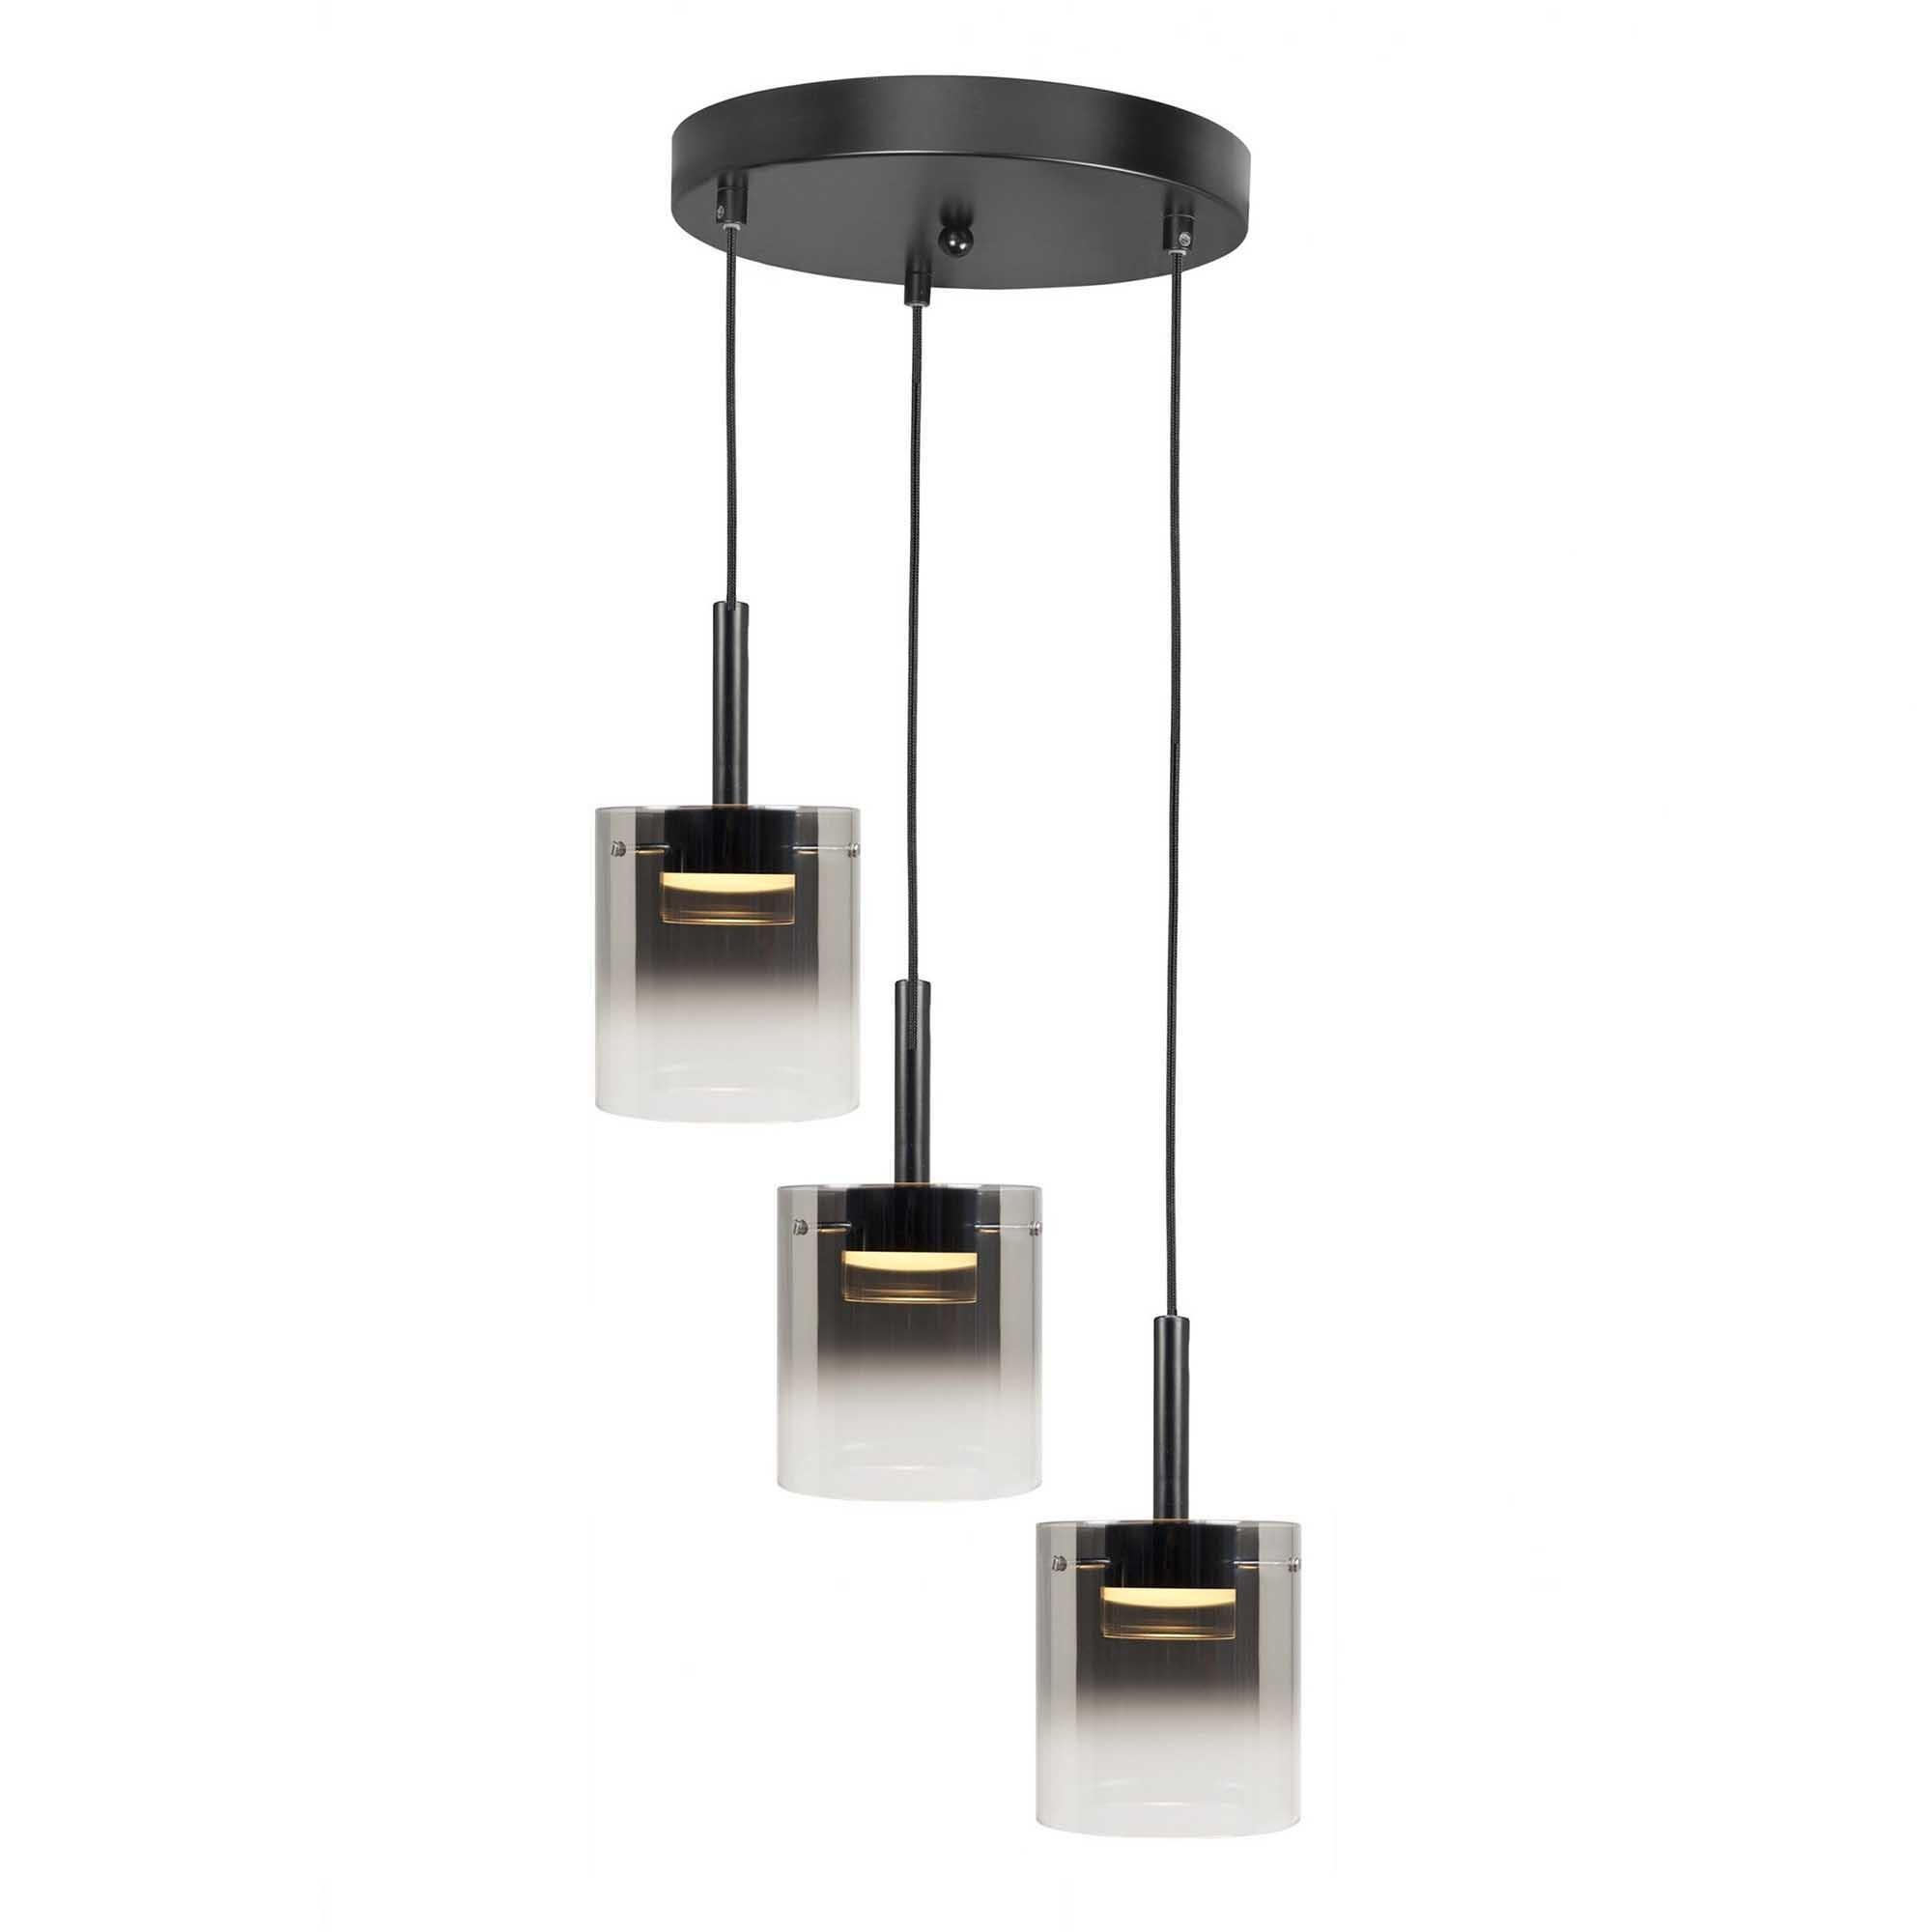 Highlight Hanglamp Salerno 3 lichts Ø 38 cm zwart